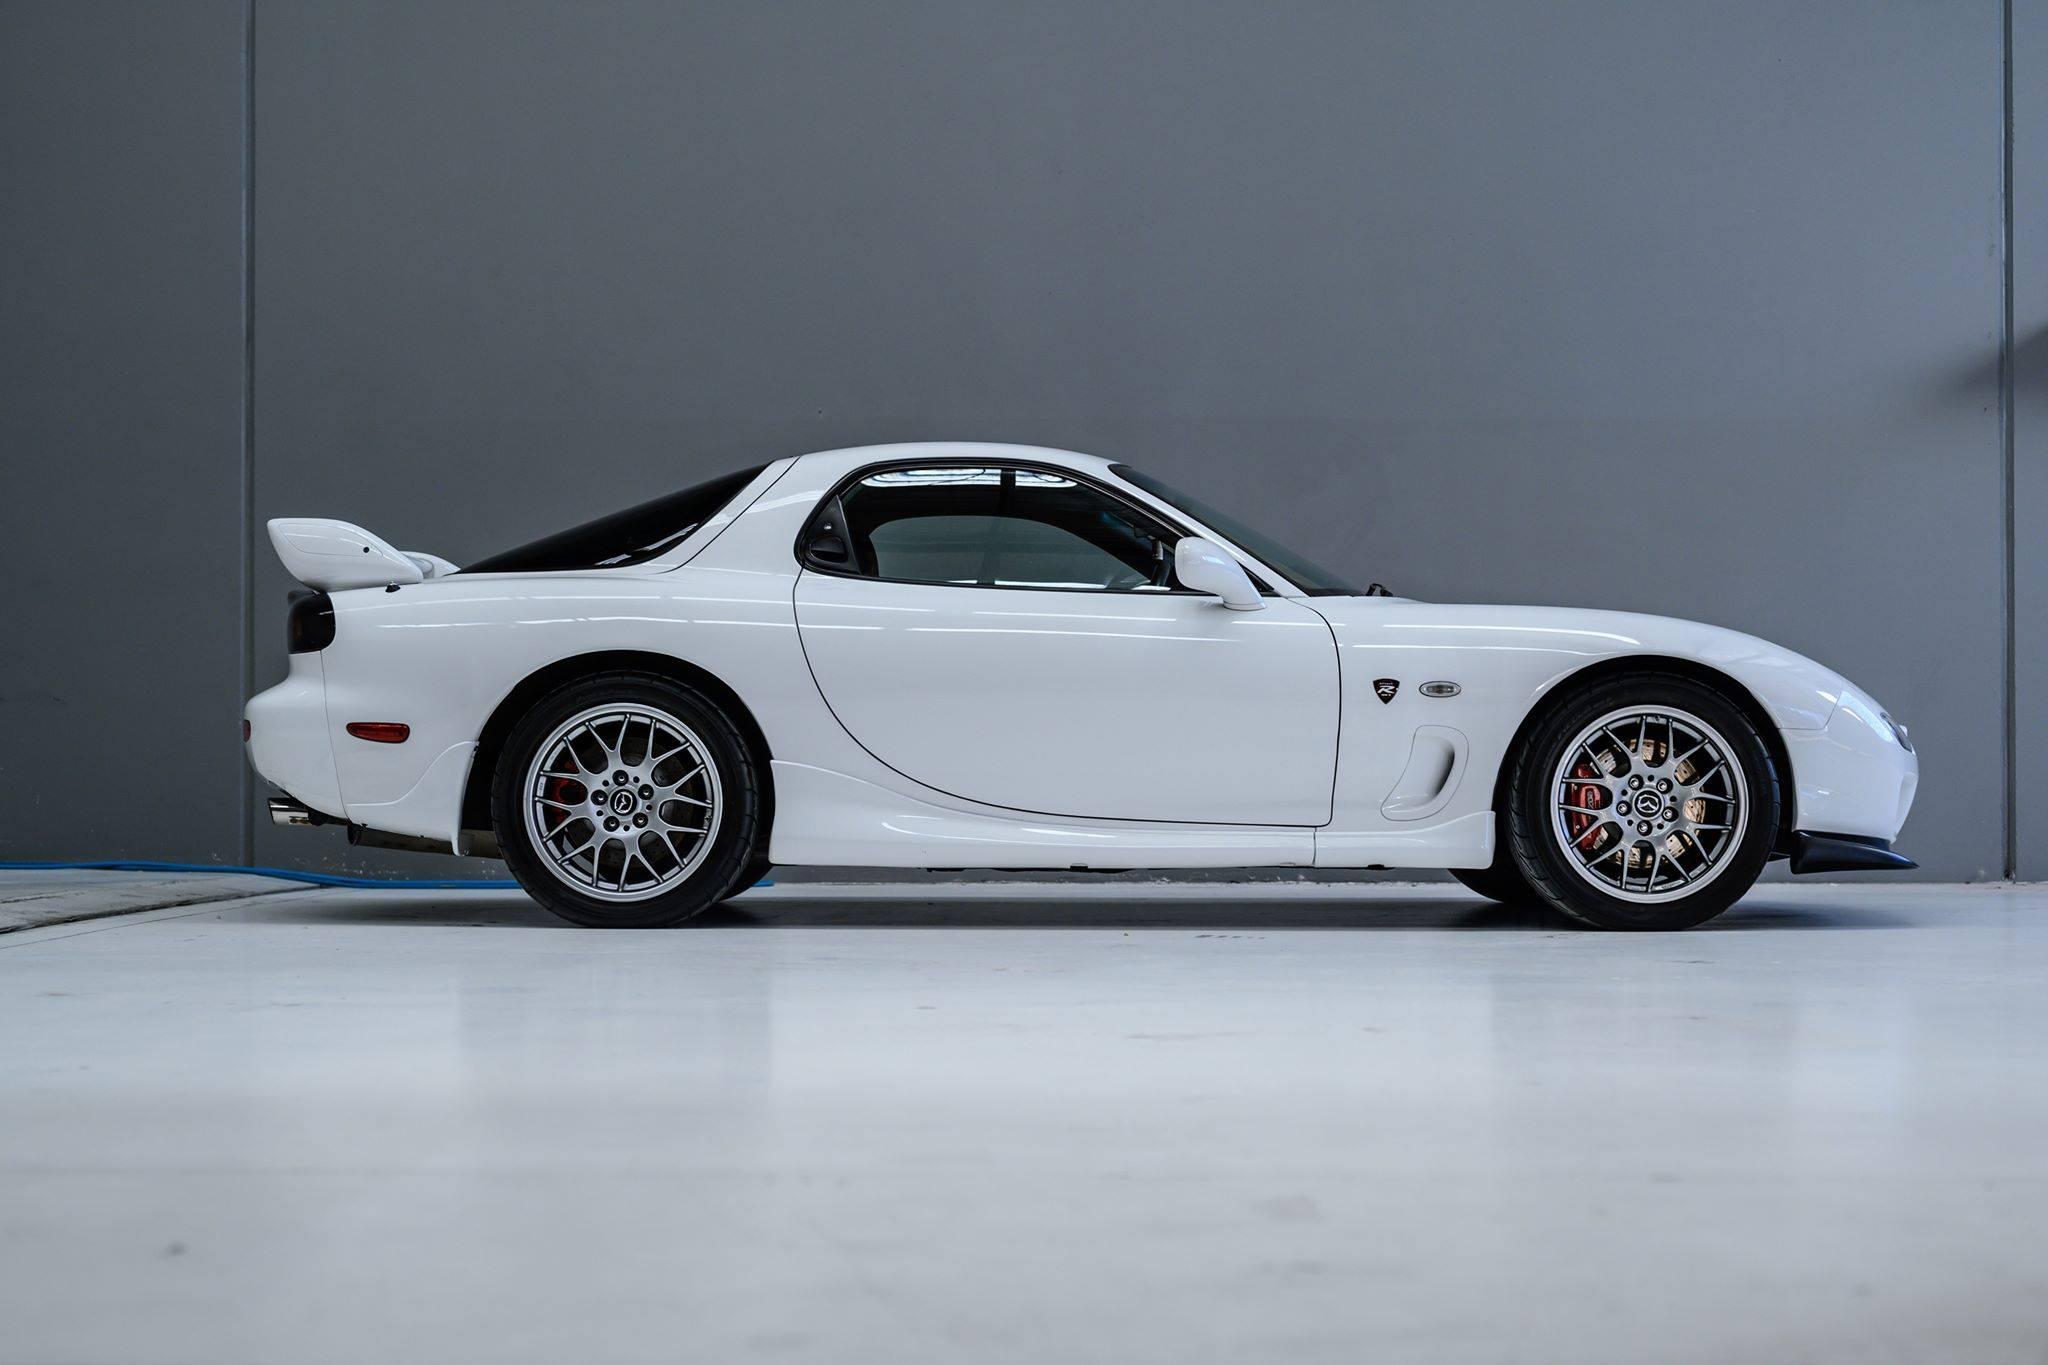 2002_Mazda_RX-7_Spirit-R_Type-A_sale_0009